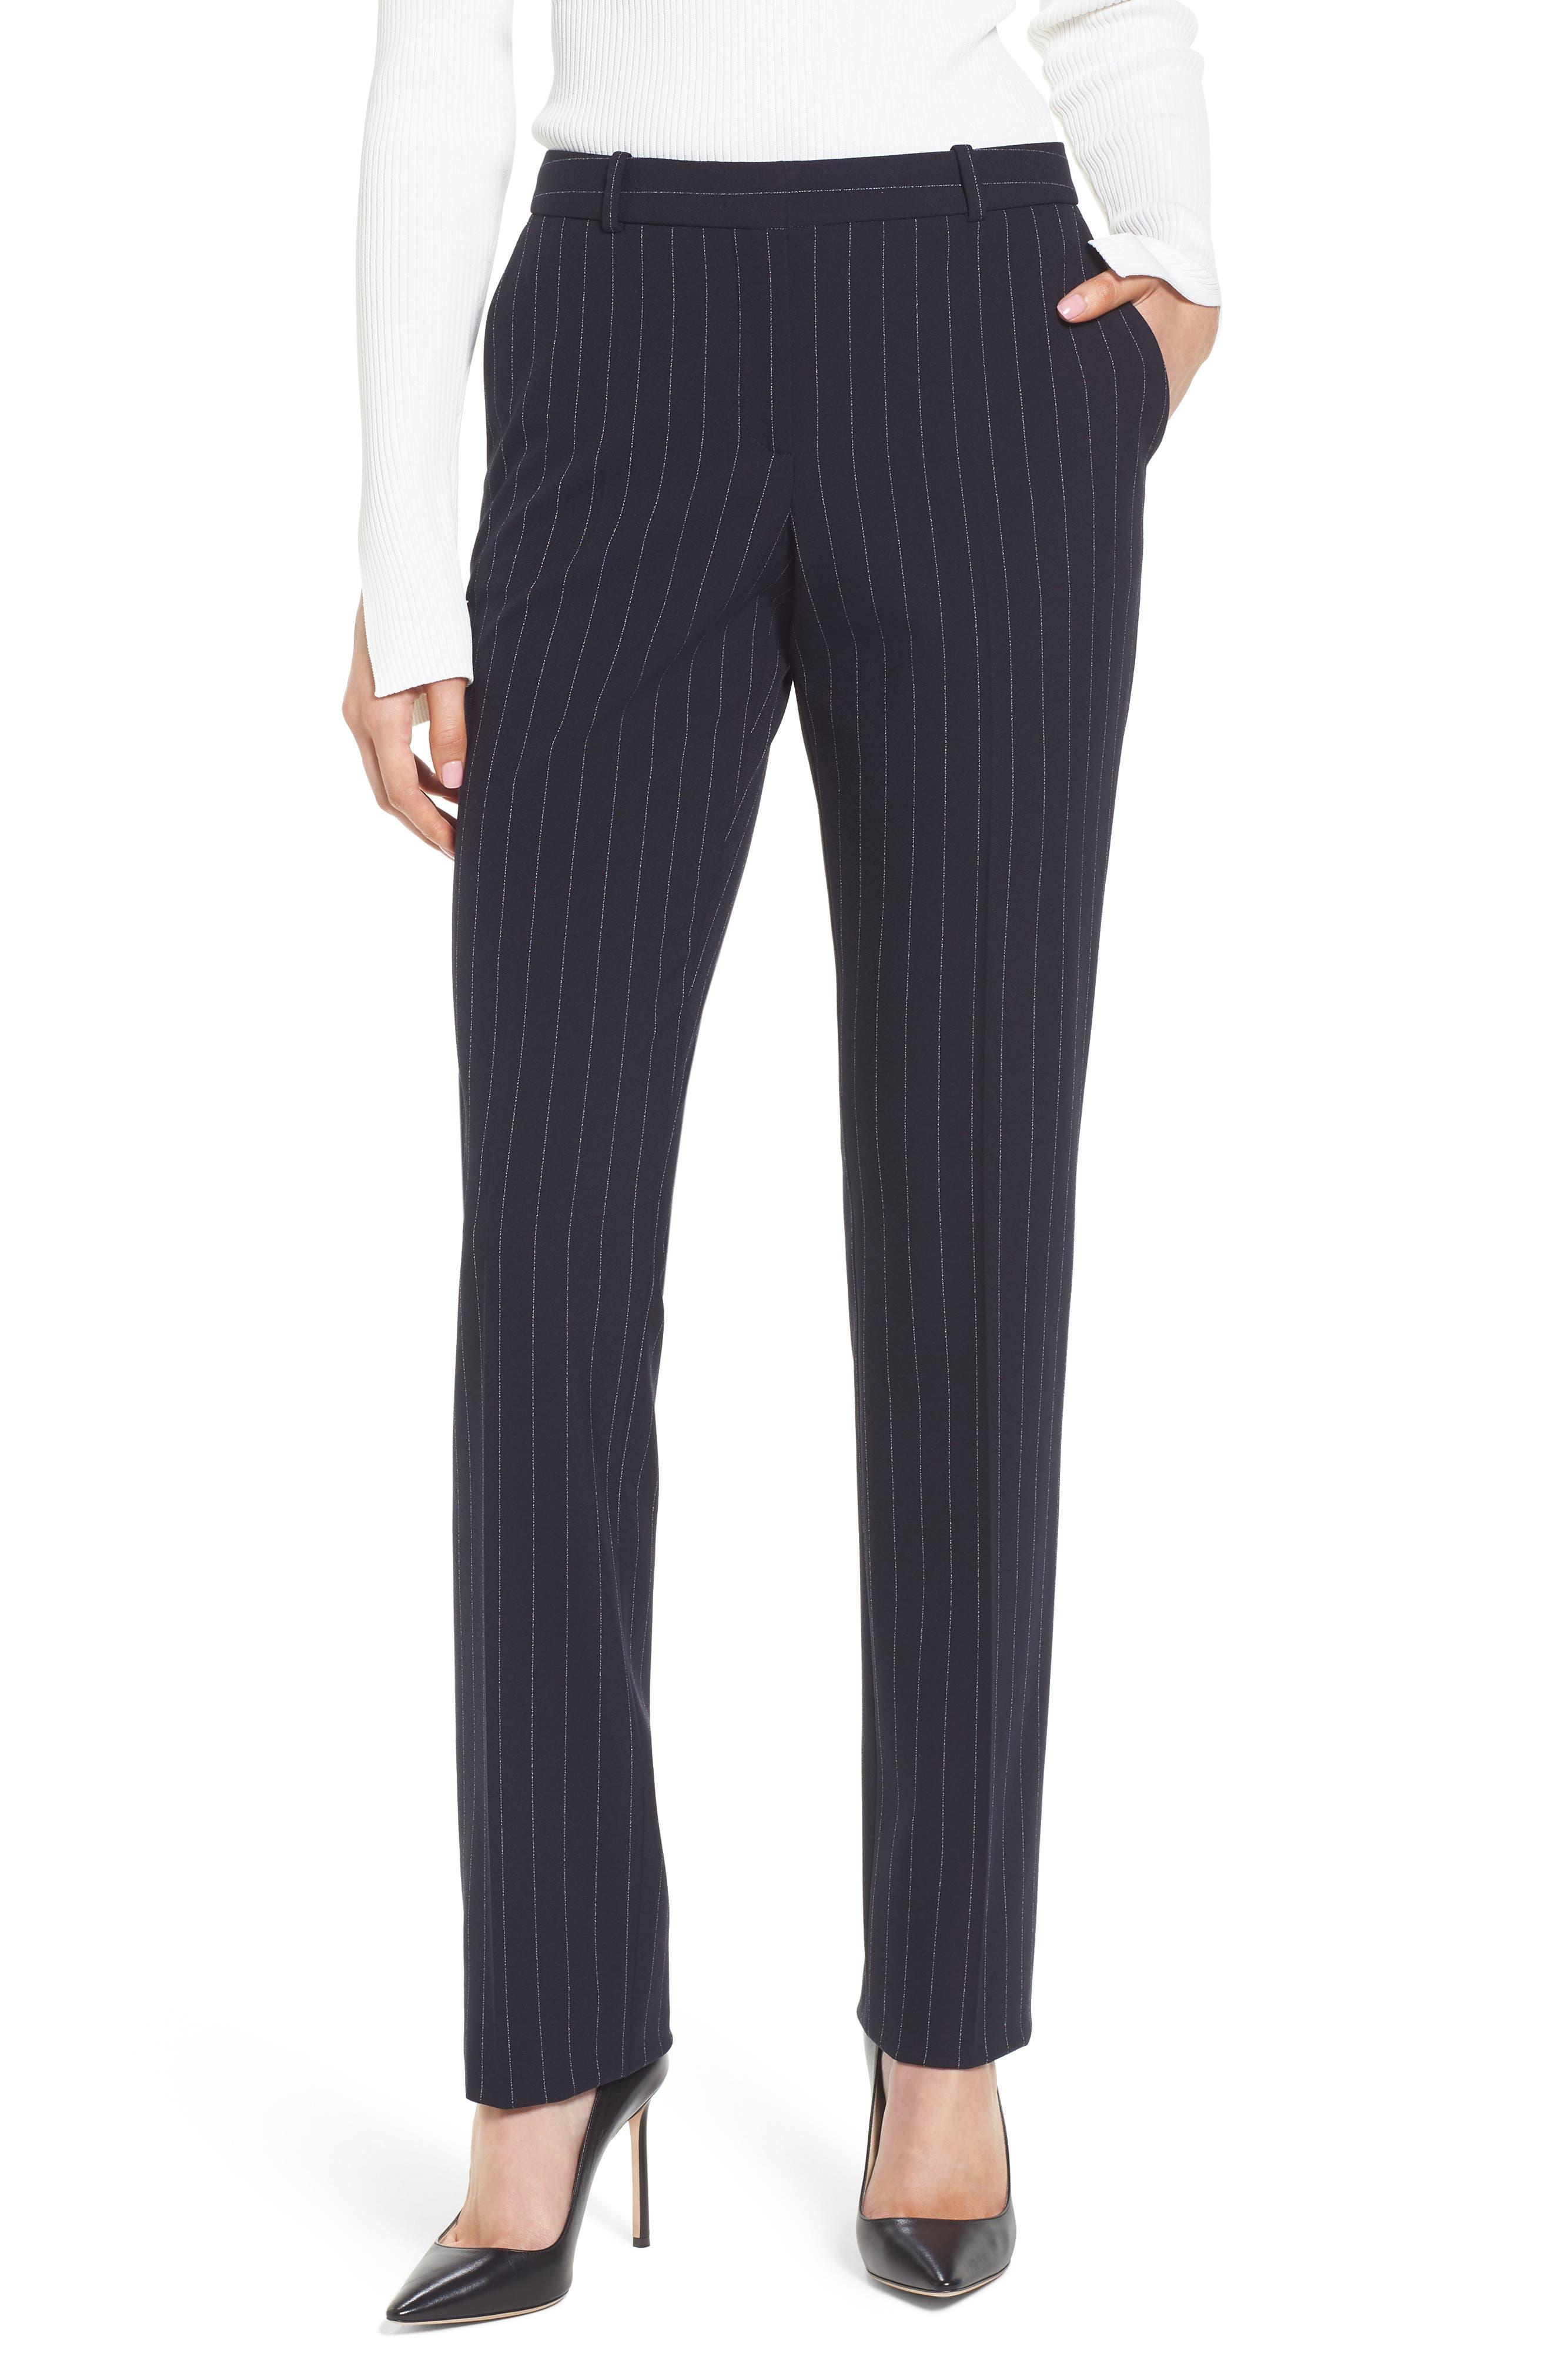 Titana Pinstripe Suit Trousers,                             Main thumbnail 1, color,                             461